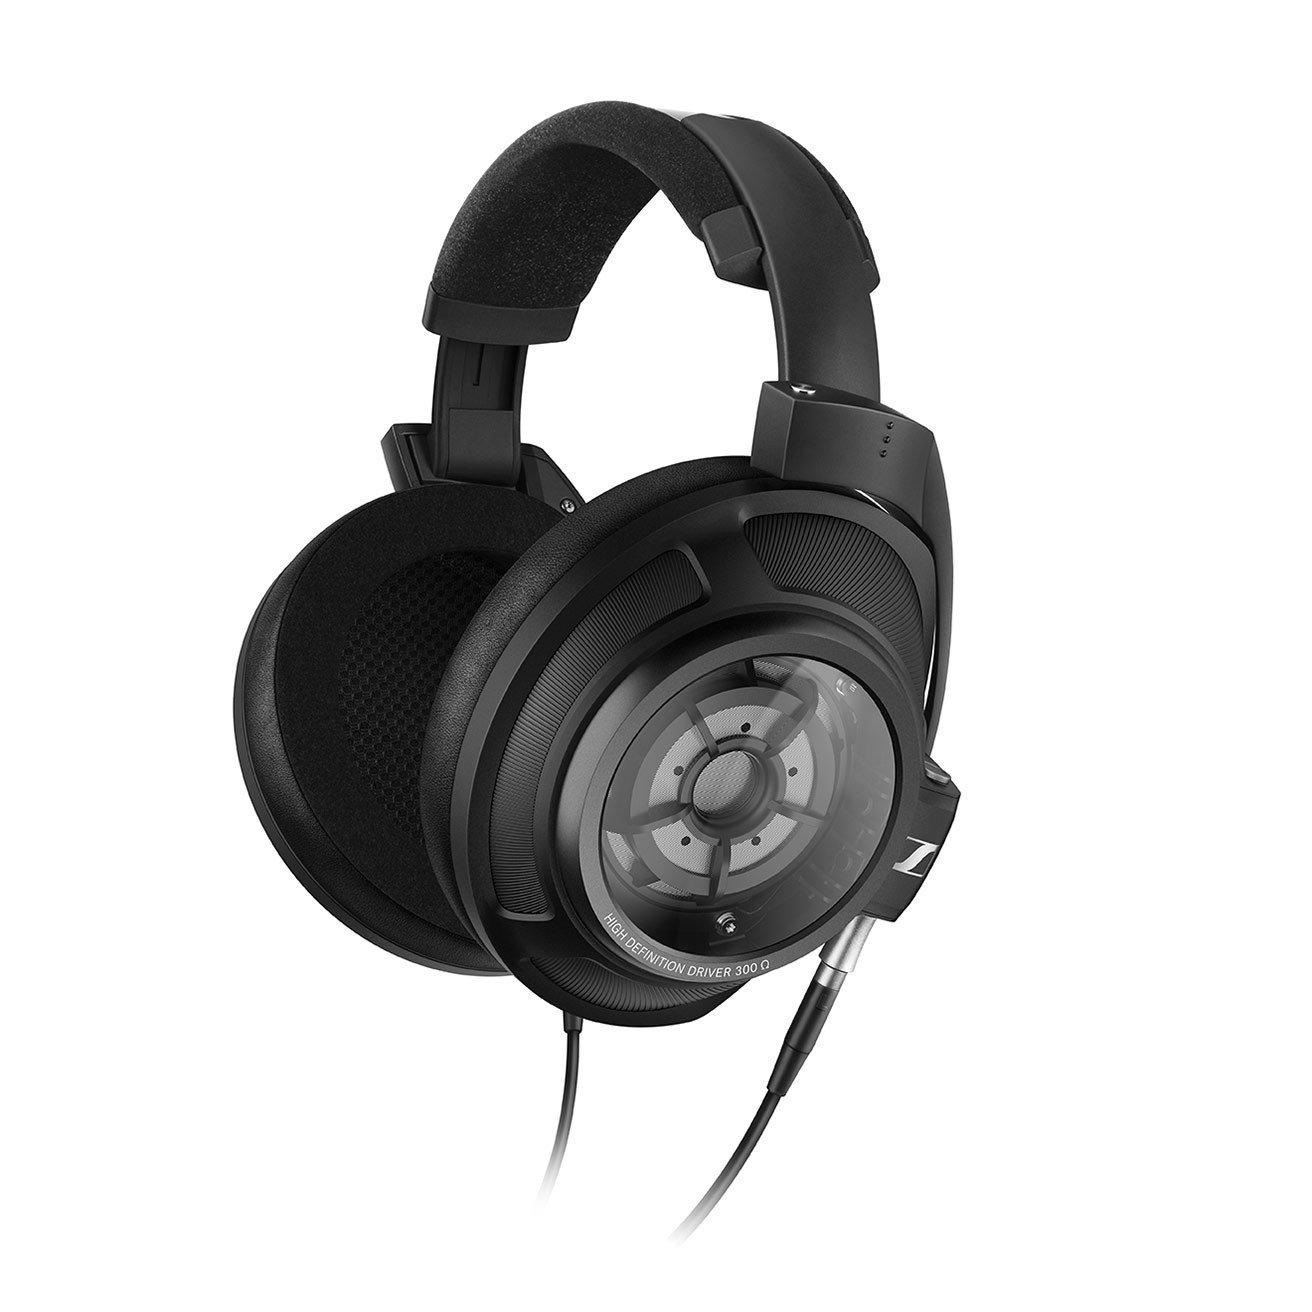 High End Headphones >> Endorphin Balanced Hardwired High End Headphone Cable For Sennheiser Hd820